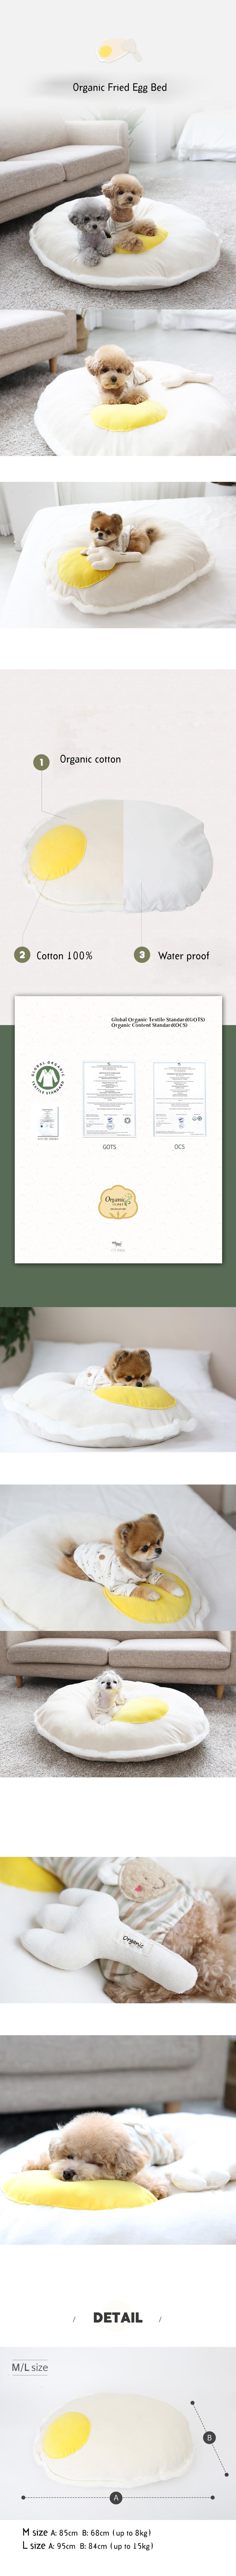 organic-fried-egg-bed-detailpage.jpg